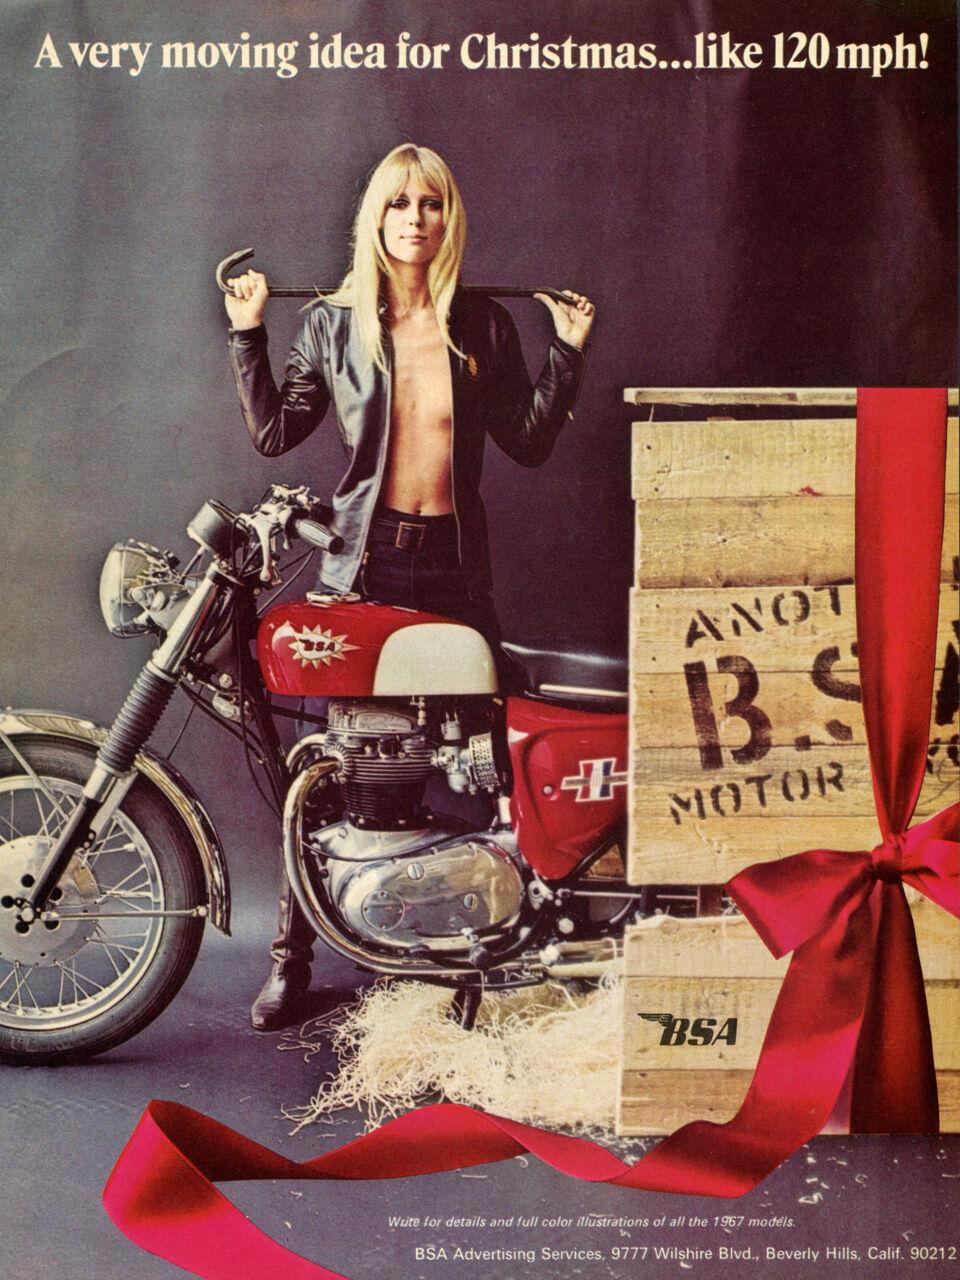 1976 KAWASAKI KZ900 MOTORCYCLE AD POSTER PRINT 50x36 BIG 9MIL PAPER